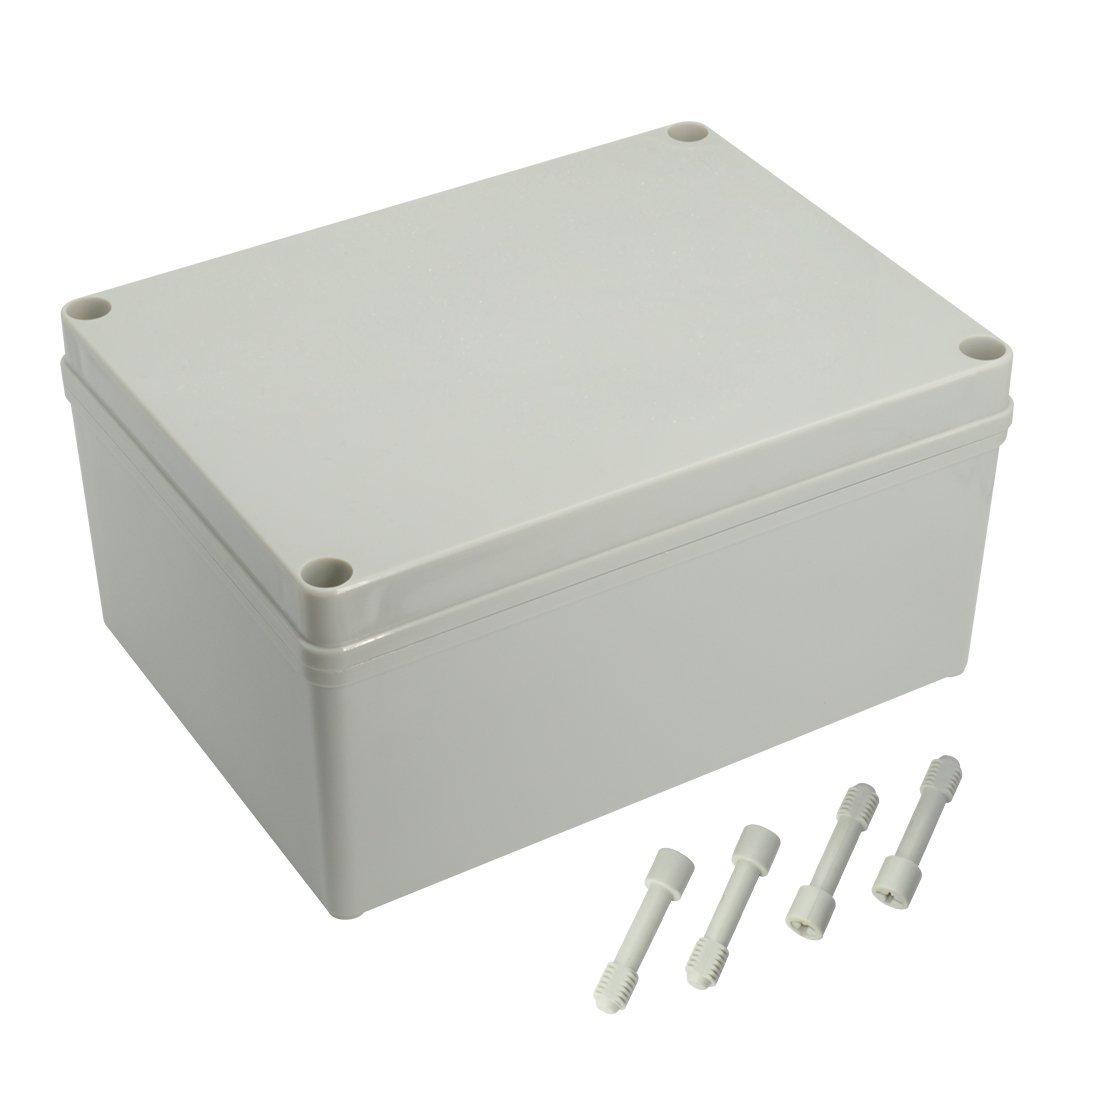 LeMotech Waterproof Dustproof IP67 Junction Box DIY Case Enclosure Gray 7.9'' x 5.9'' x 3.9'' (200mm x 150mm x 100mm)